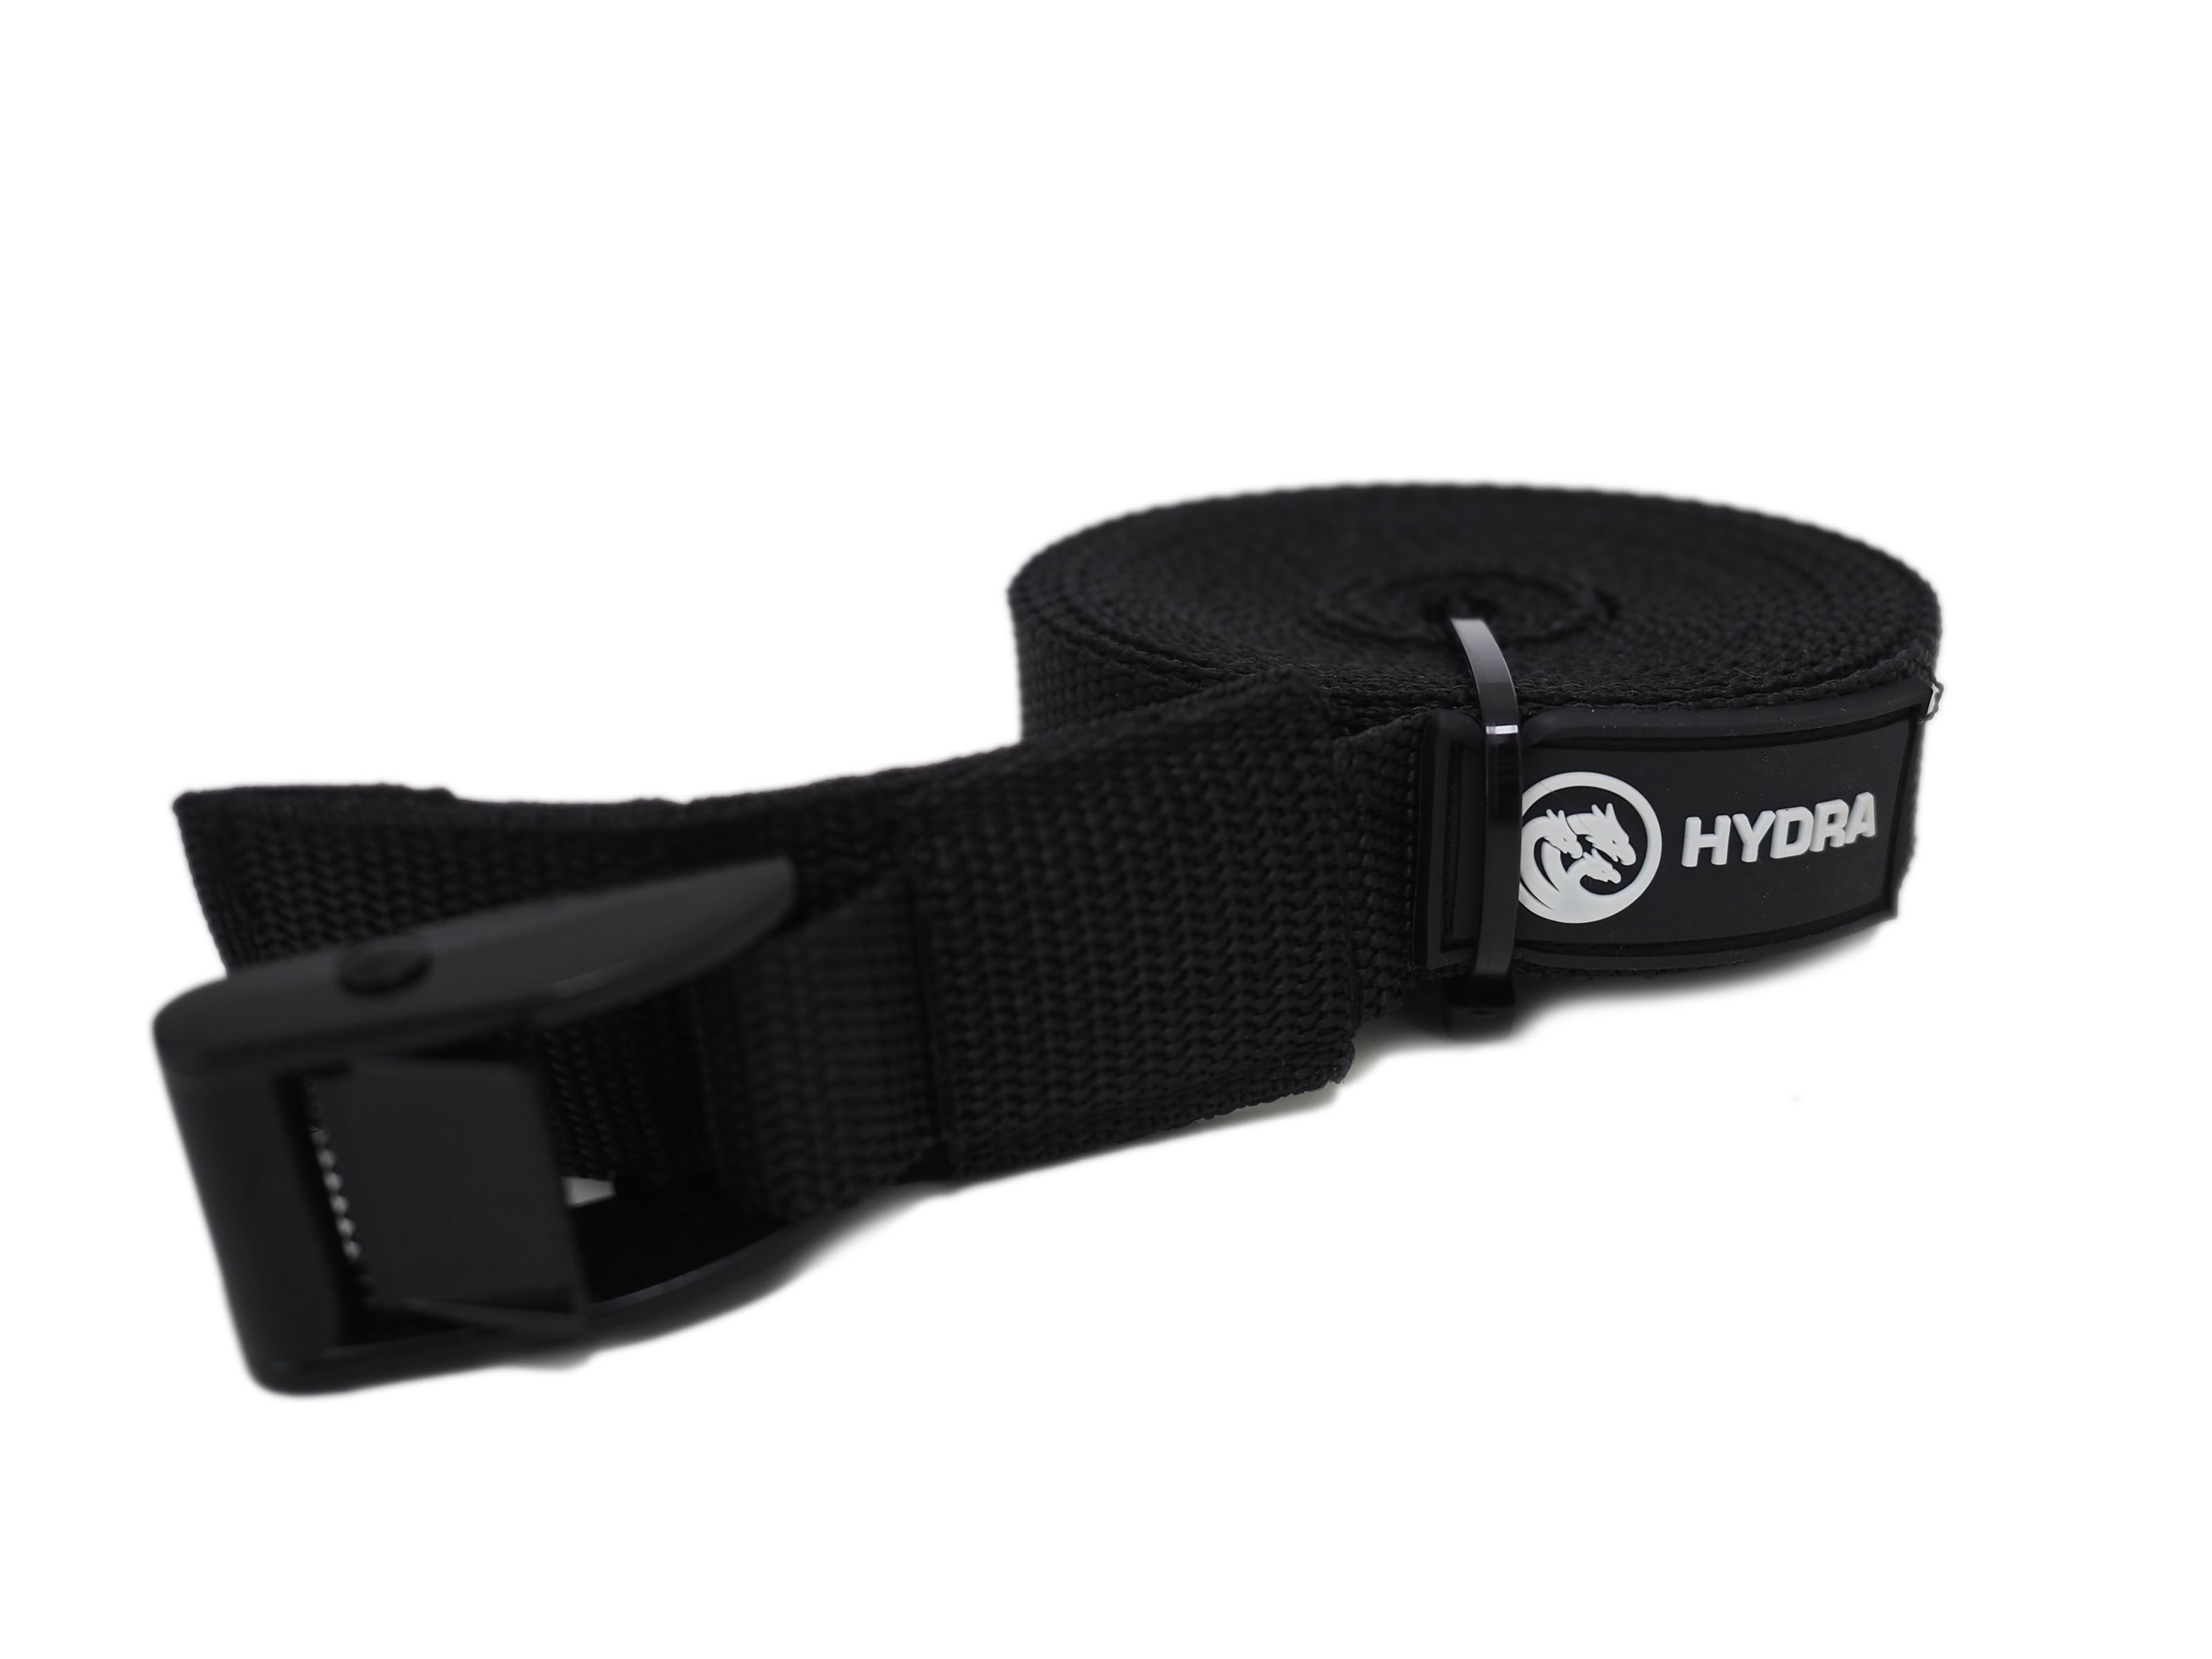 Hydra stroppesnor 1